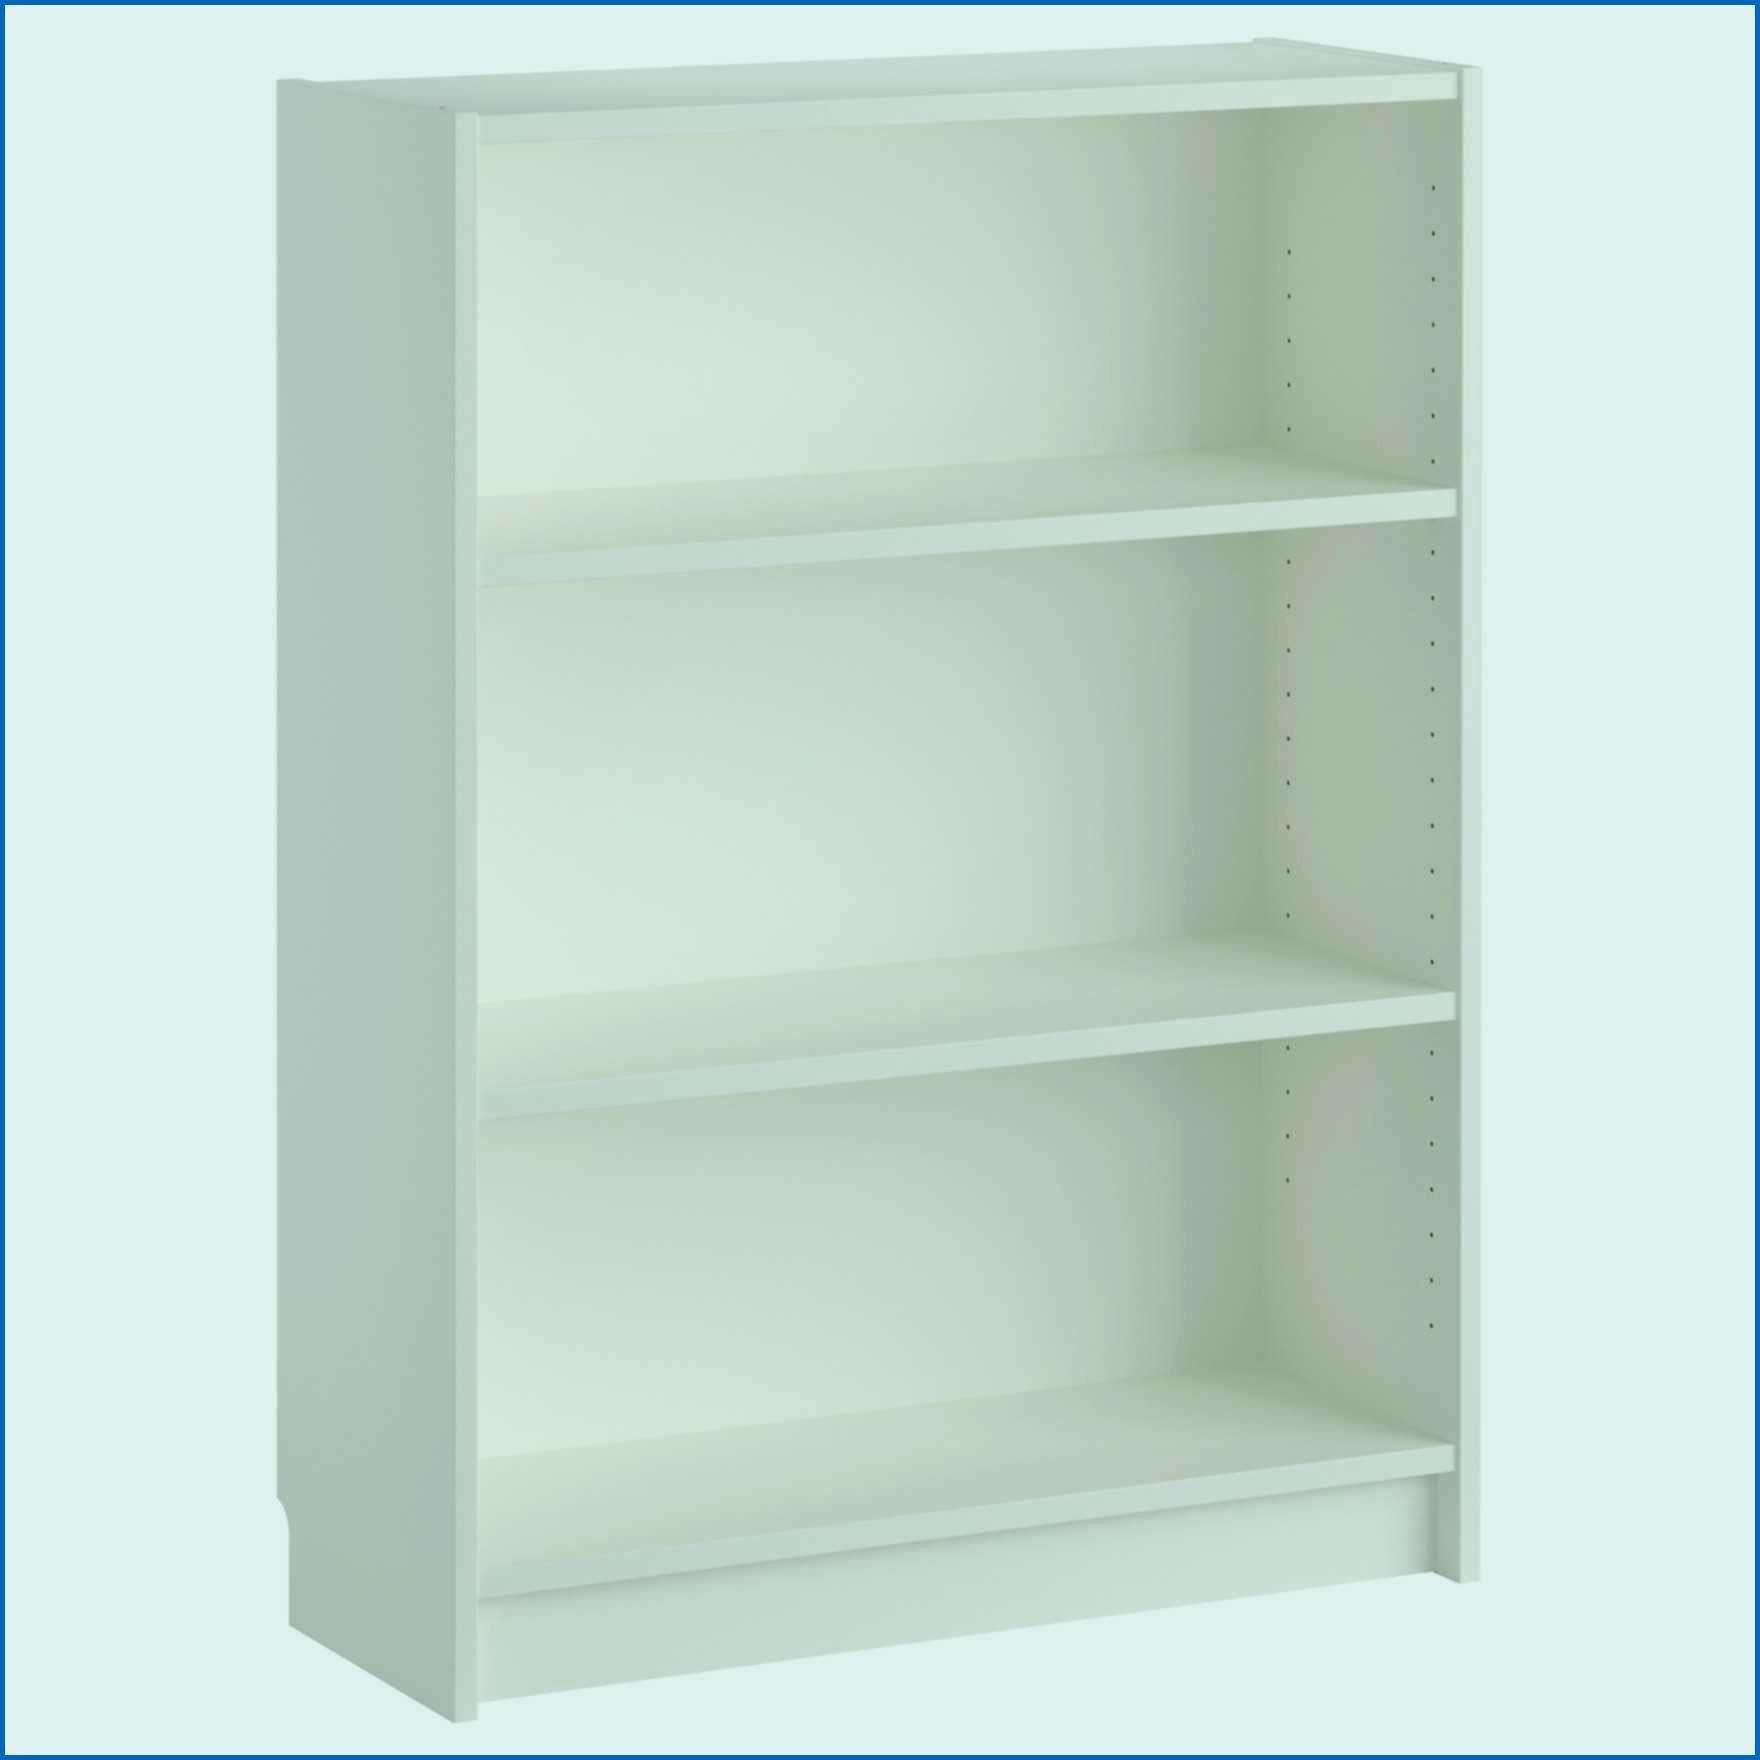 Badezimmer Regal 25 Cm Tief Stock In 2020 Home Decor Bathroom Medicine Cabinet Decor